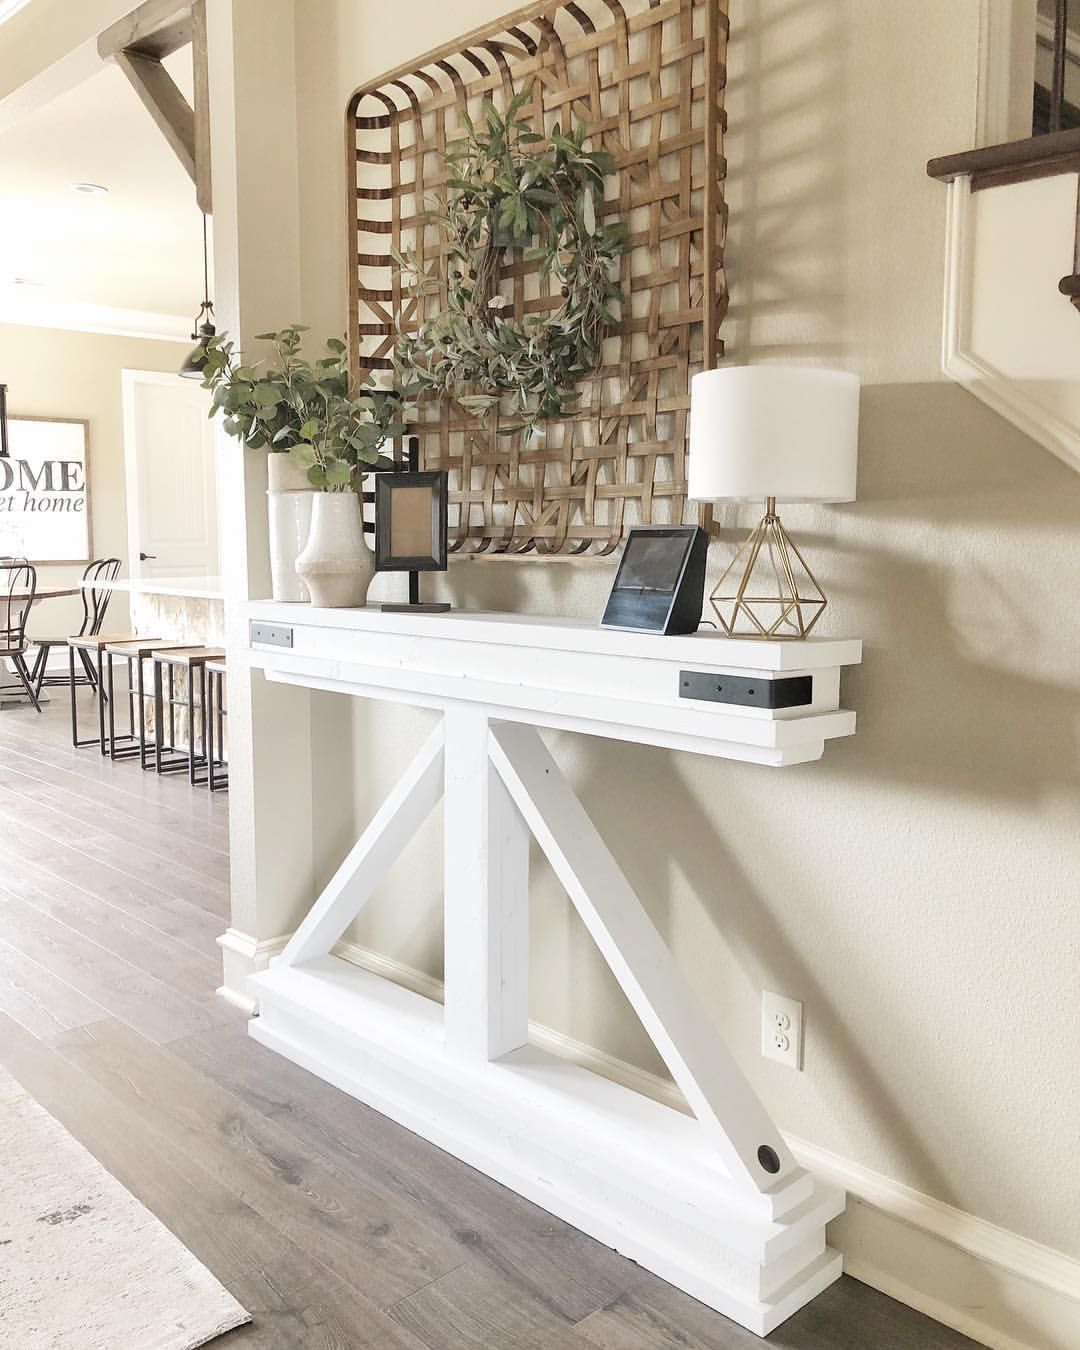 6 luxury entryway decoration ideas Insplosion Blog